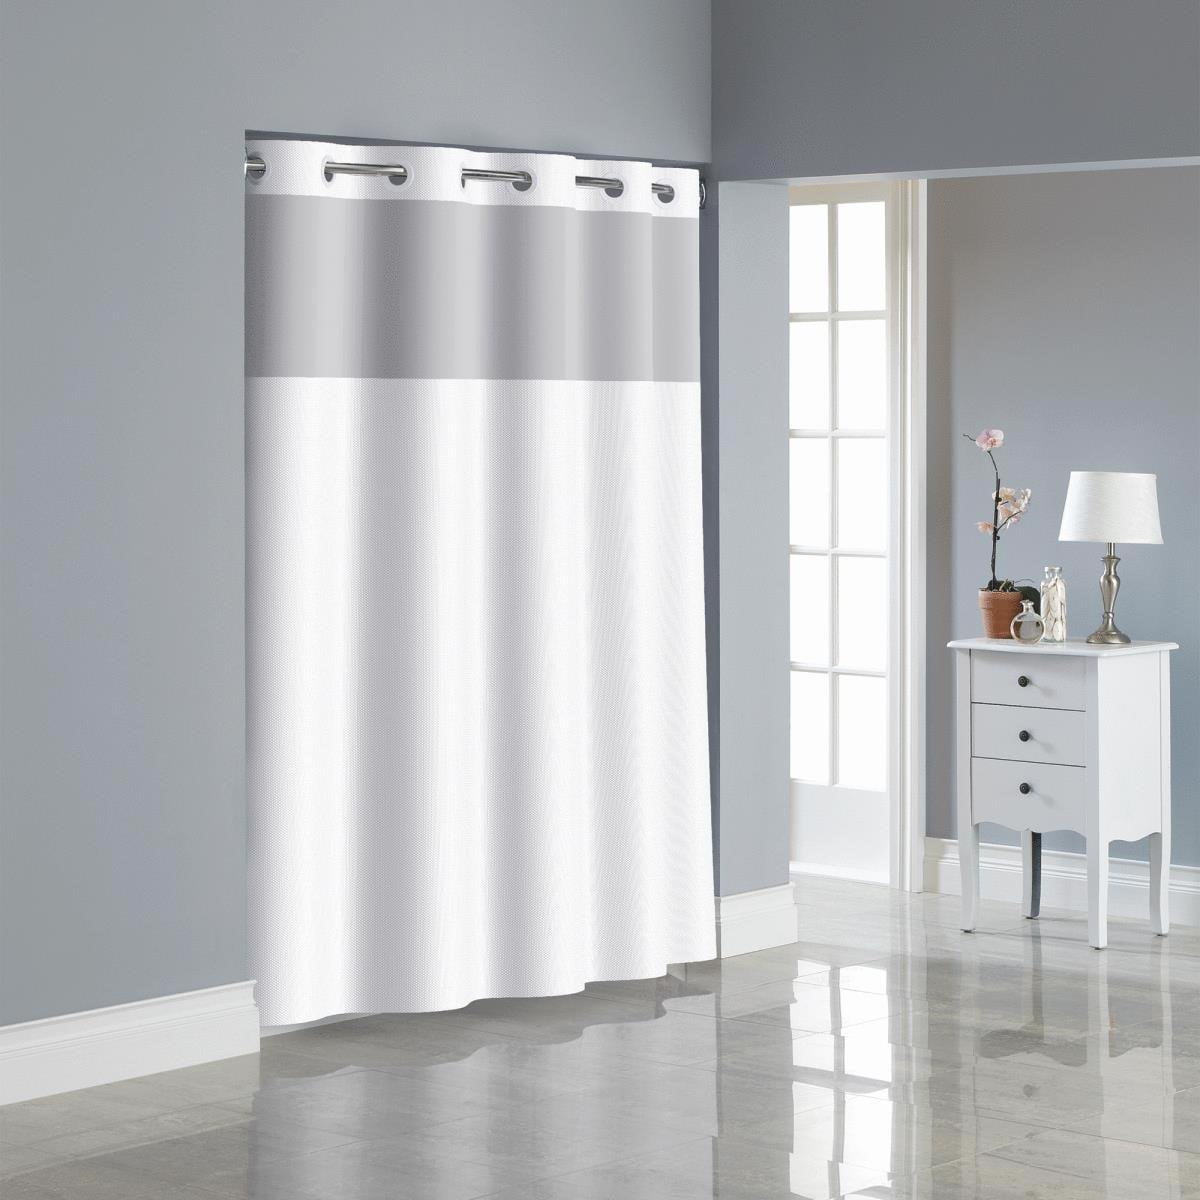 Surefit Bright White Hookless Shower Curtain With Peva Liner 71x74 Walmart Com Walmart Com